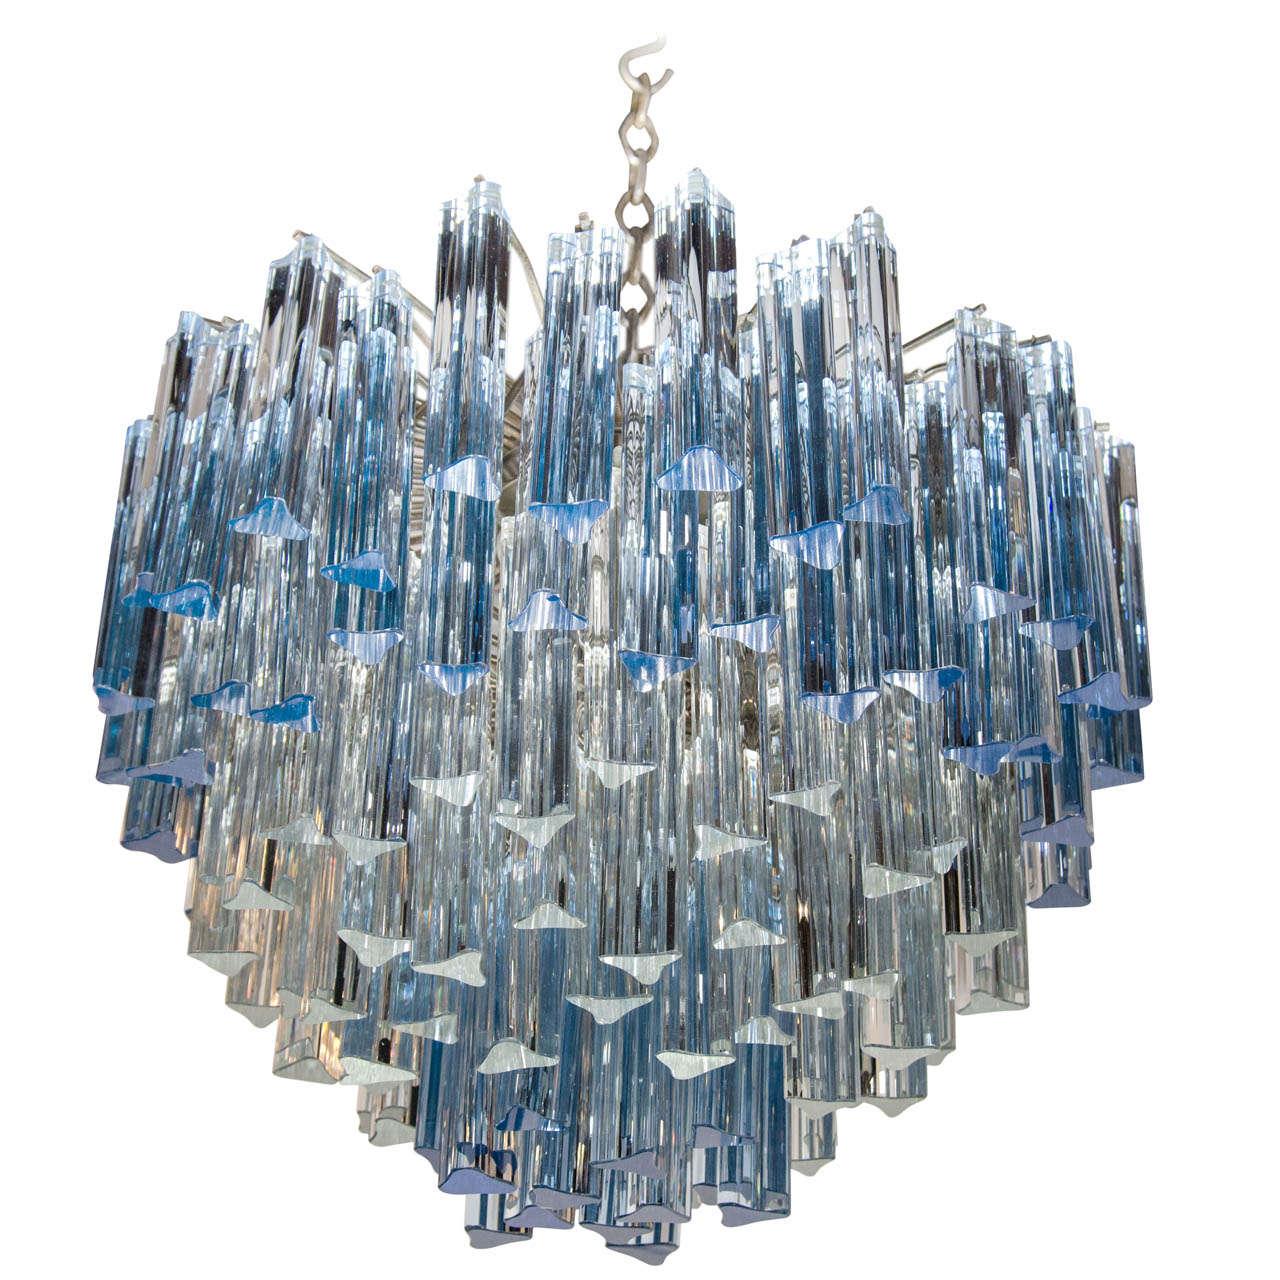 Clear crystal chandelier prisms chandelier designs blue chandelier crystals designs mozeypictures Gallery